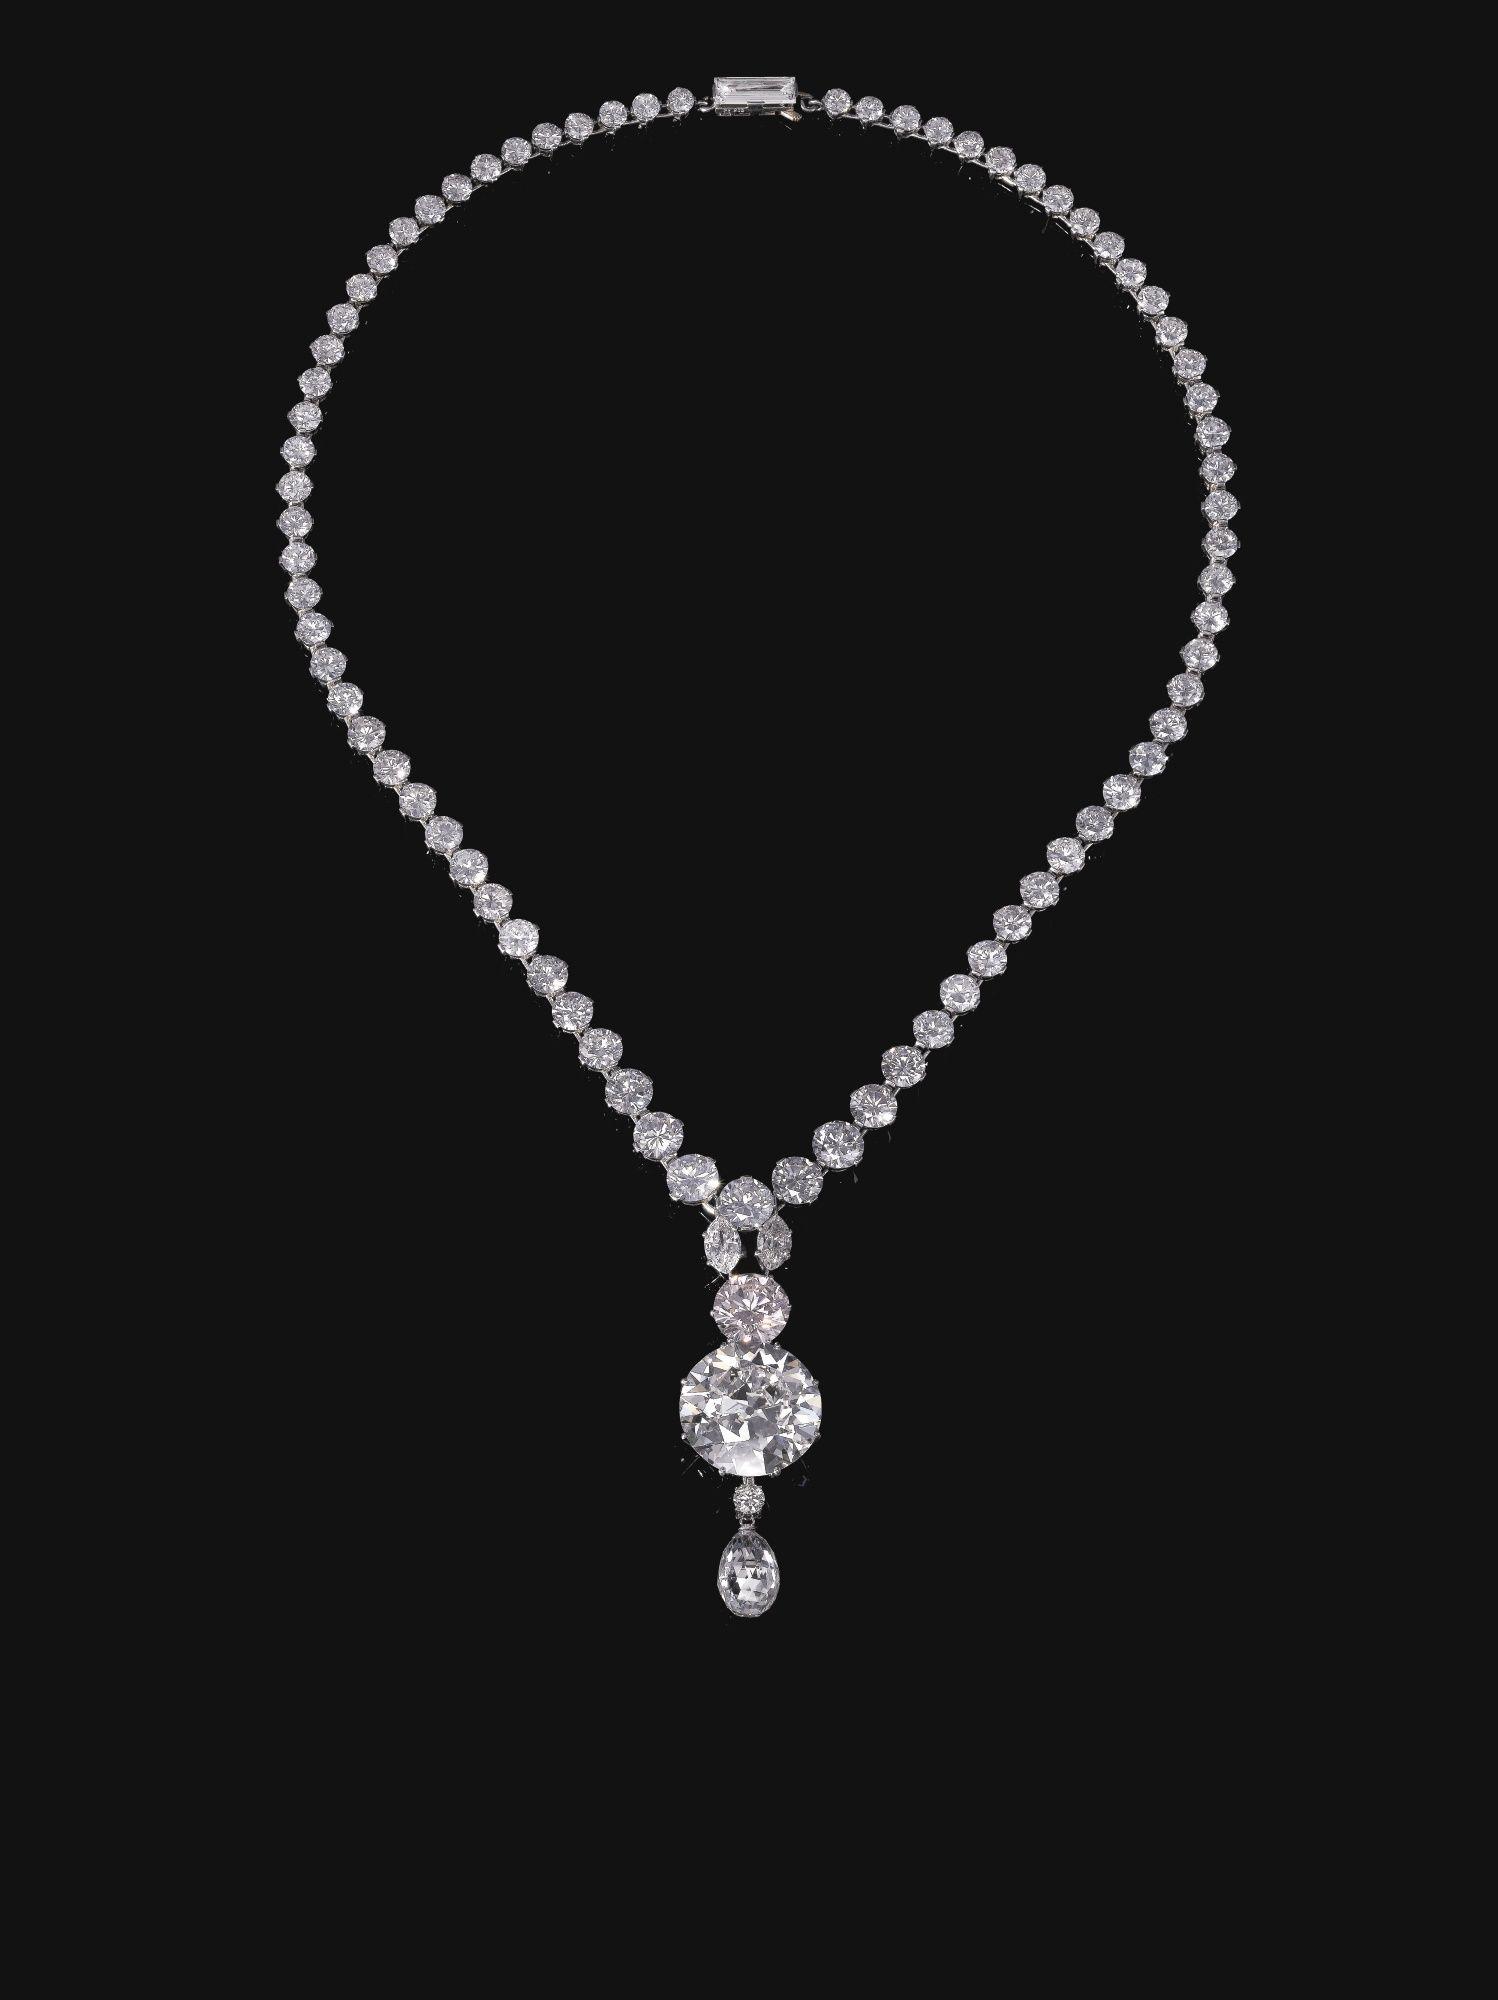 Light pink diamond necklace